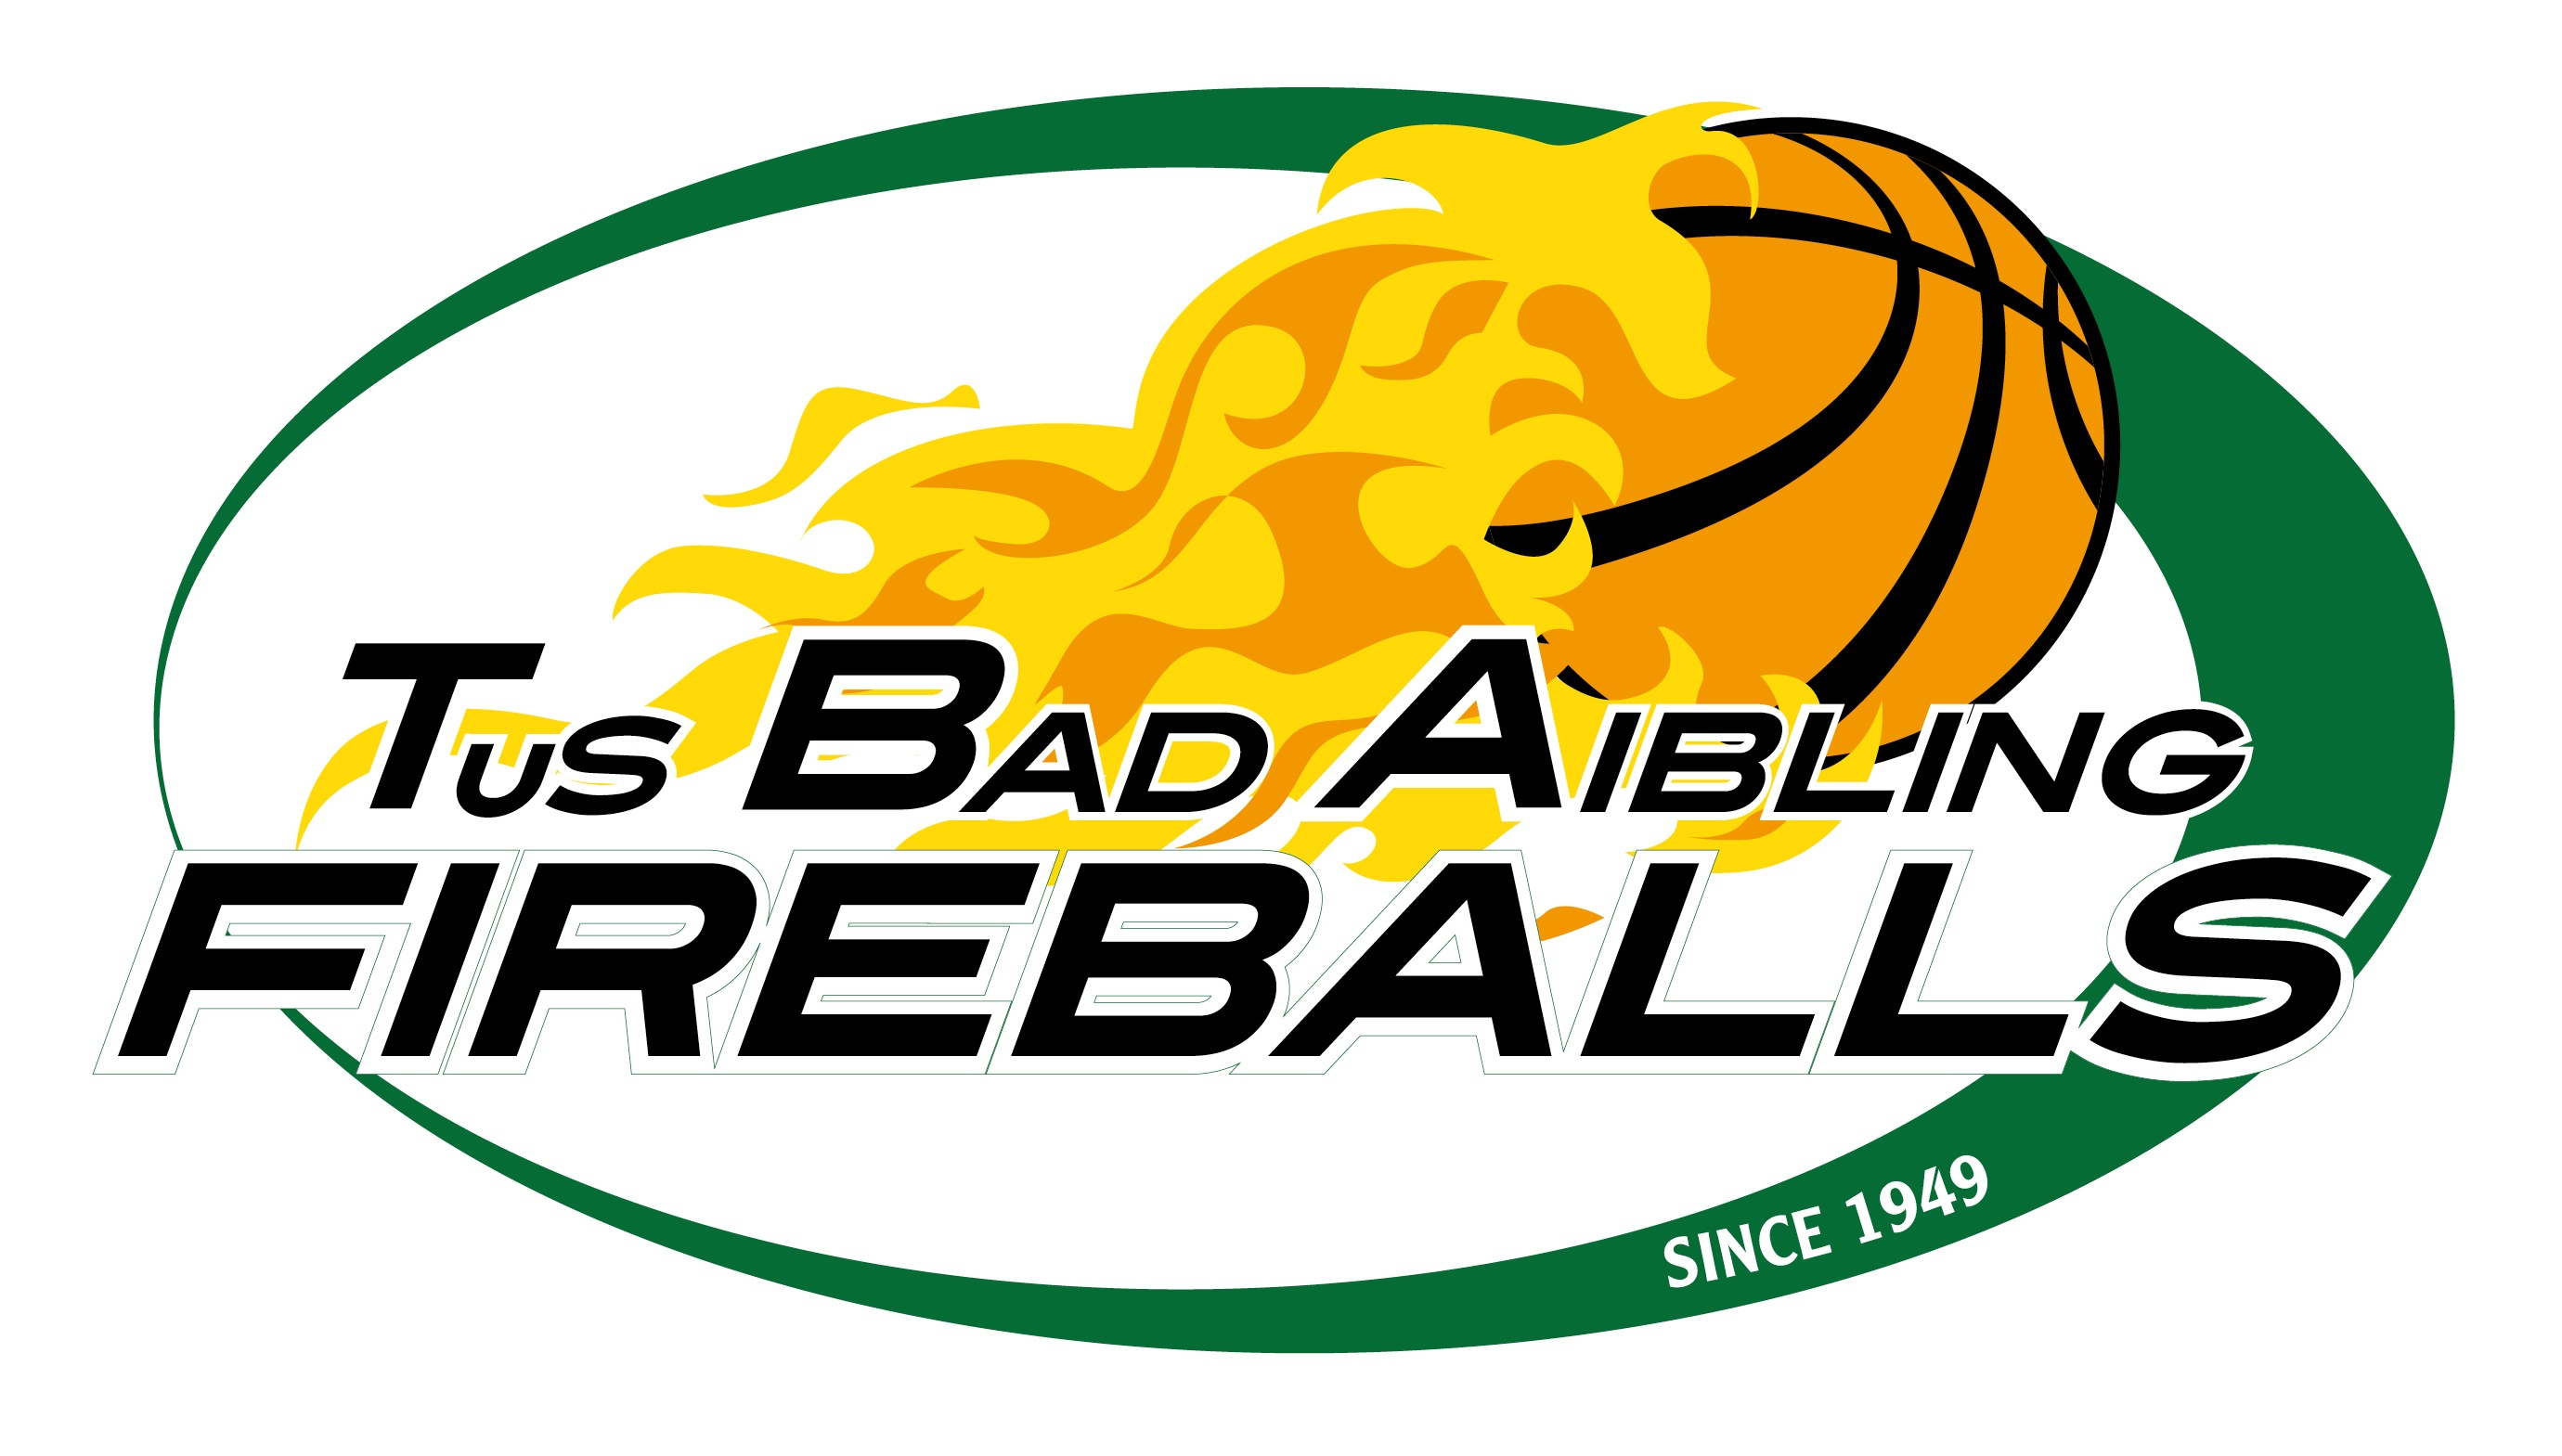 bad aibling fireballs